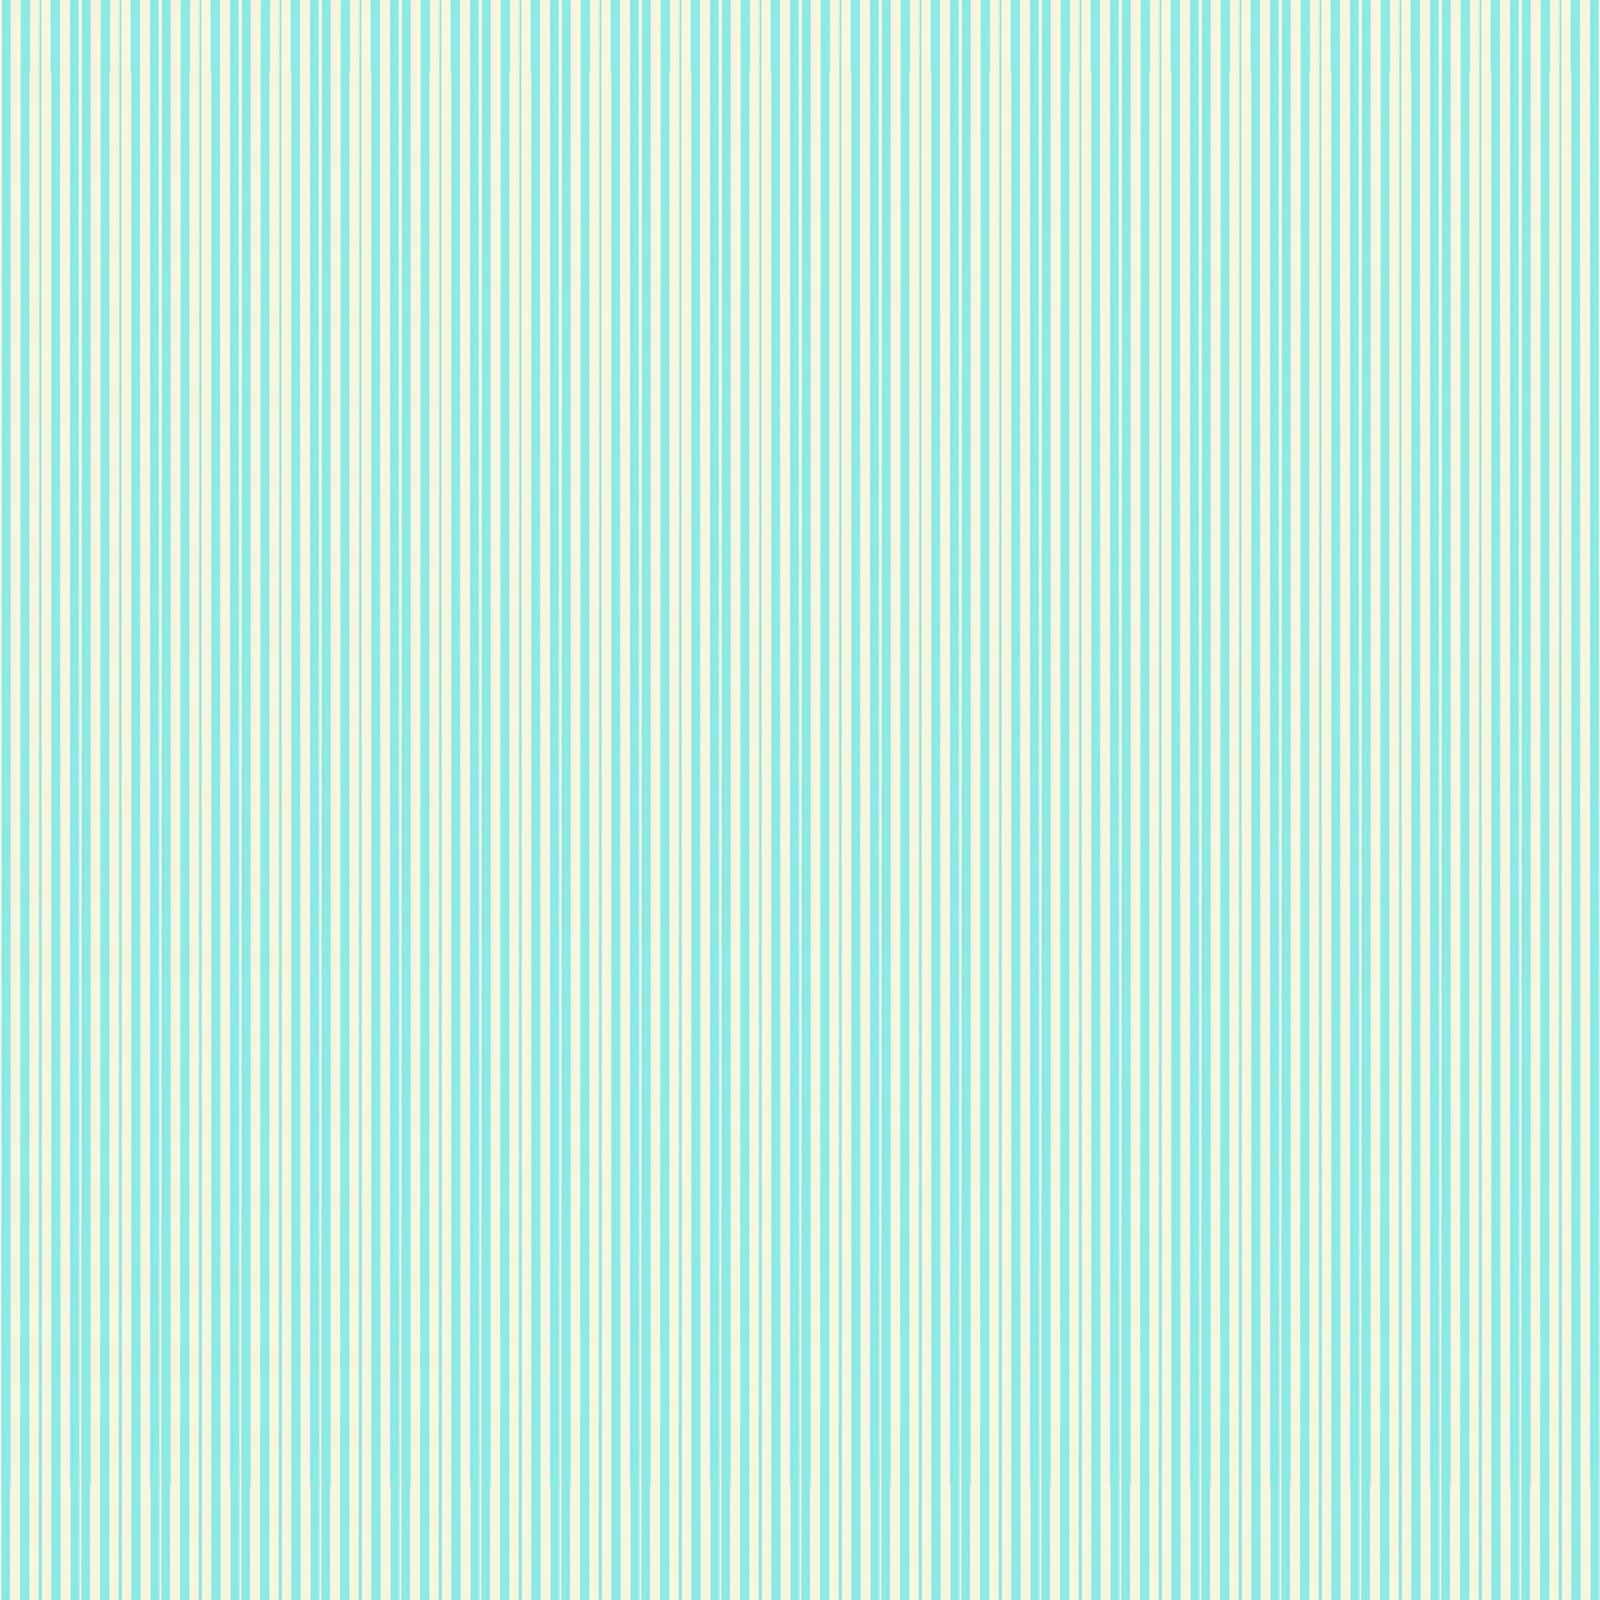 blue digital paper blue - photo #30